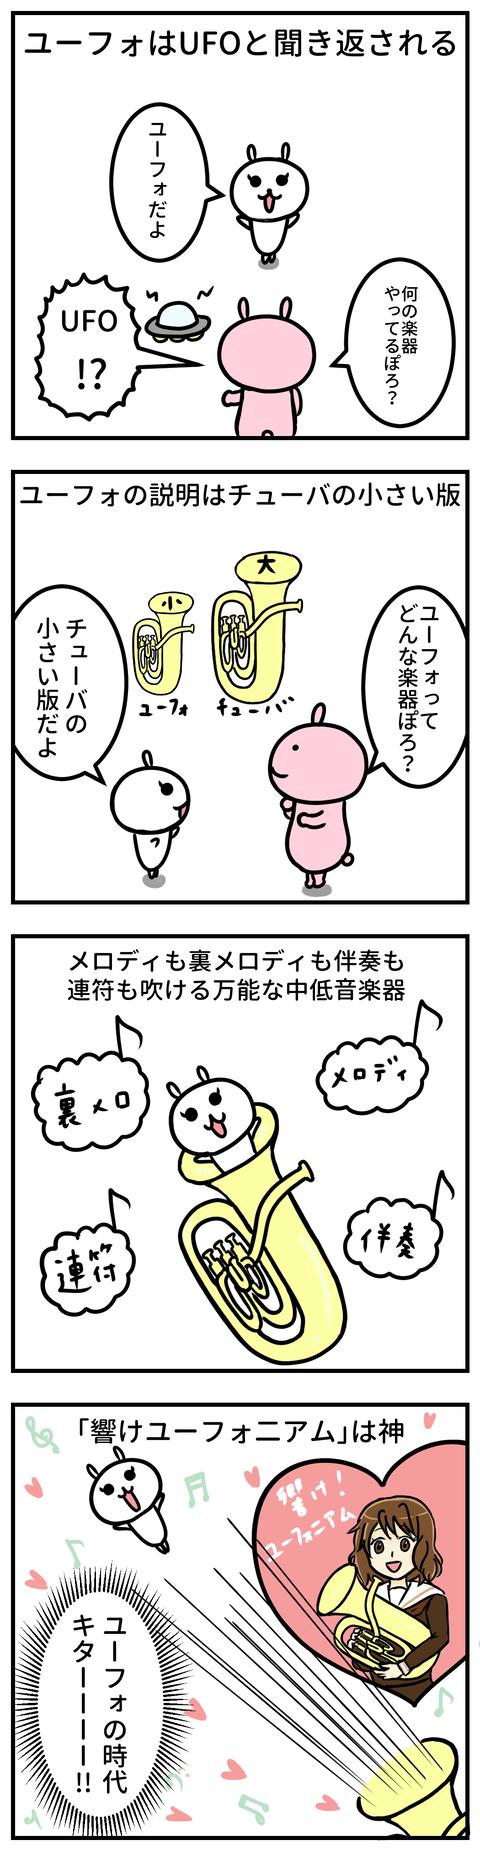 manga-yuzuporo53-1